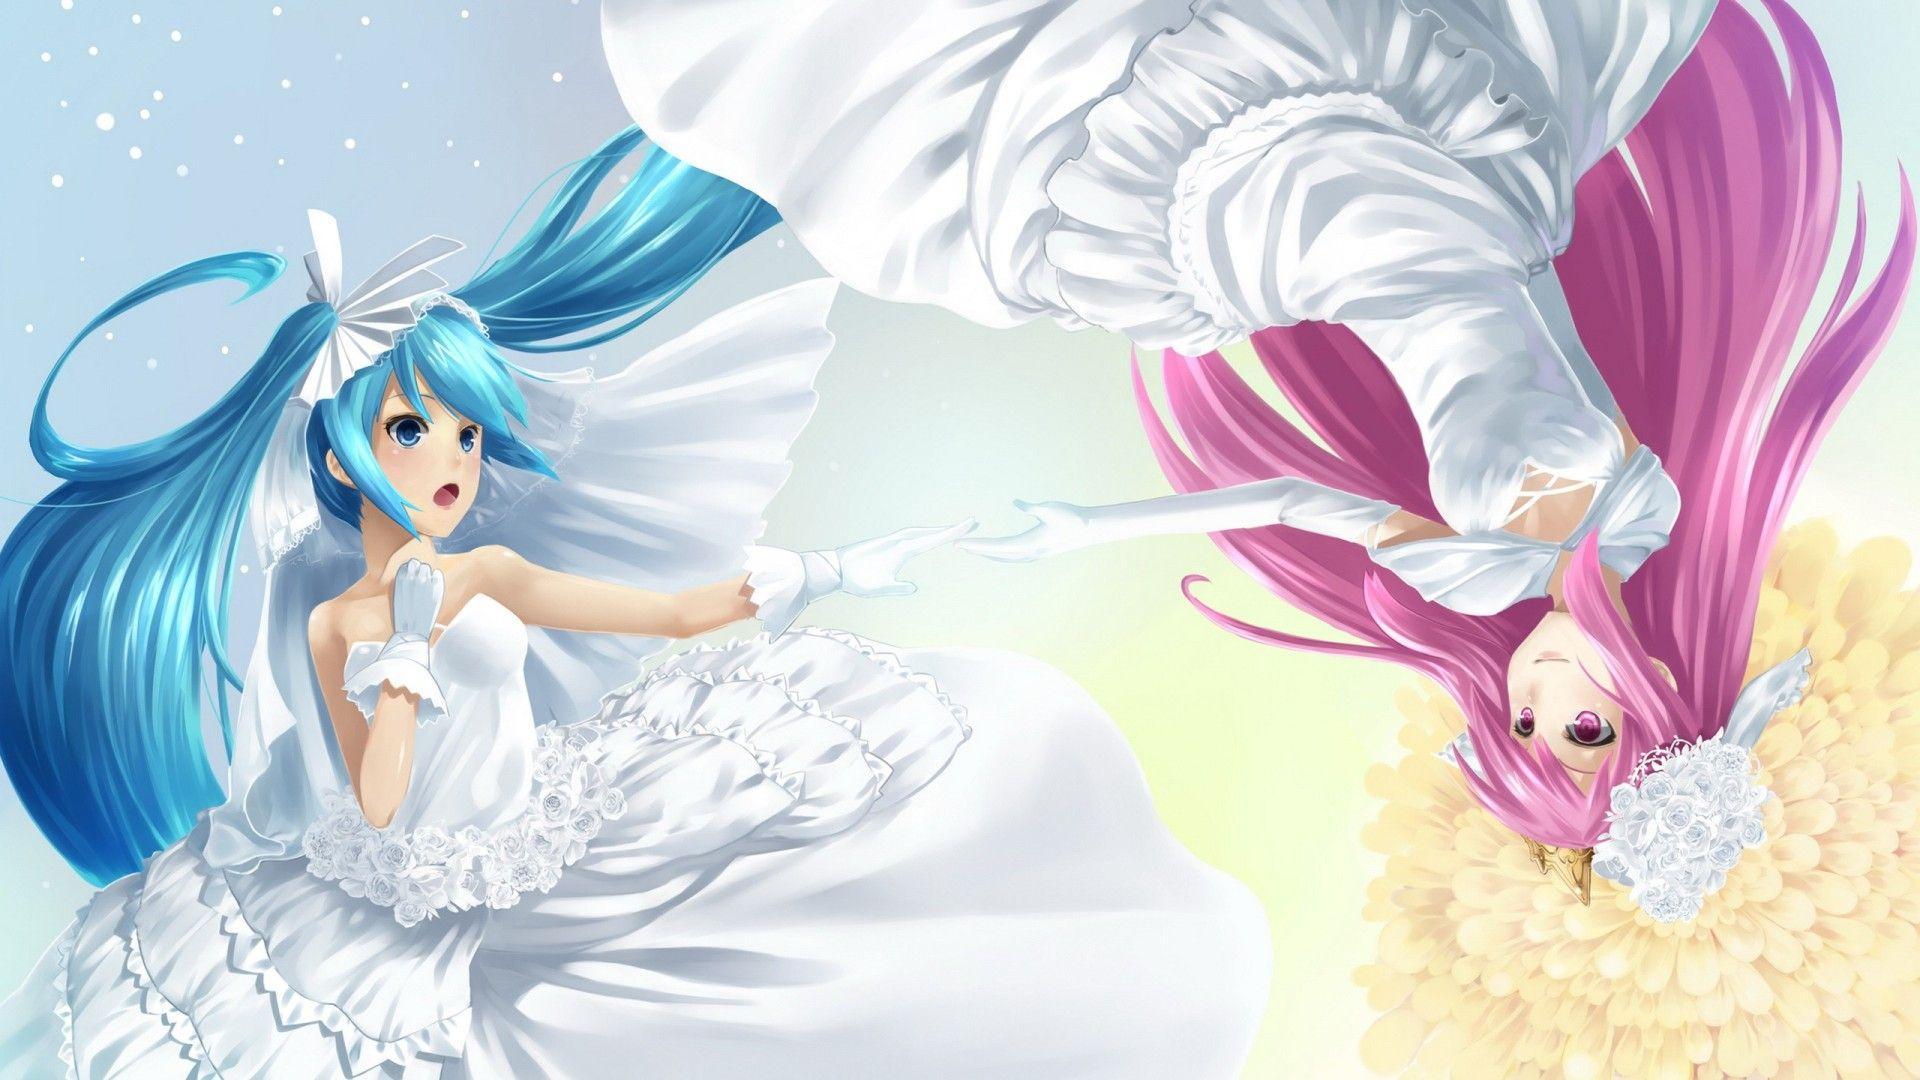 Lesbian anime wallpaper